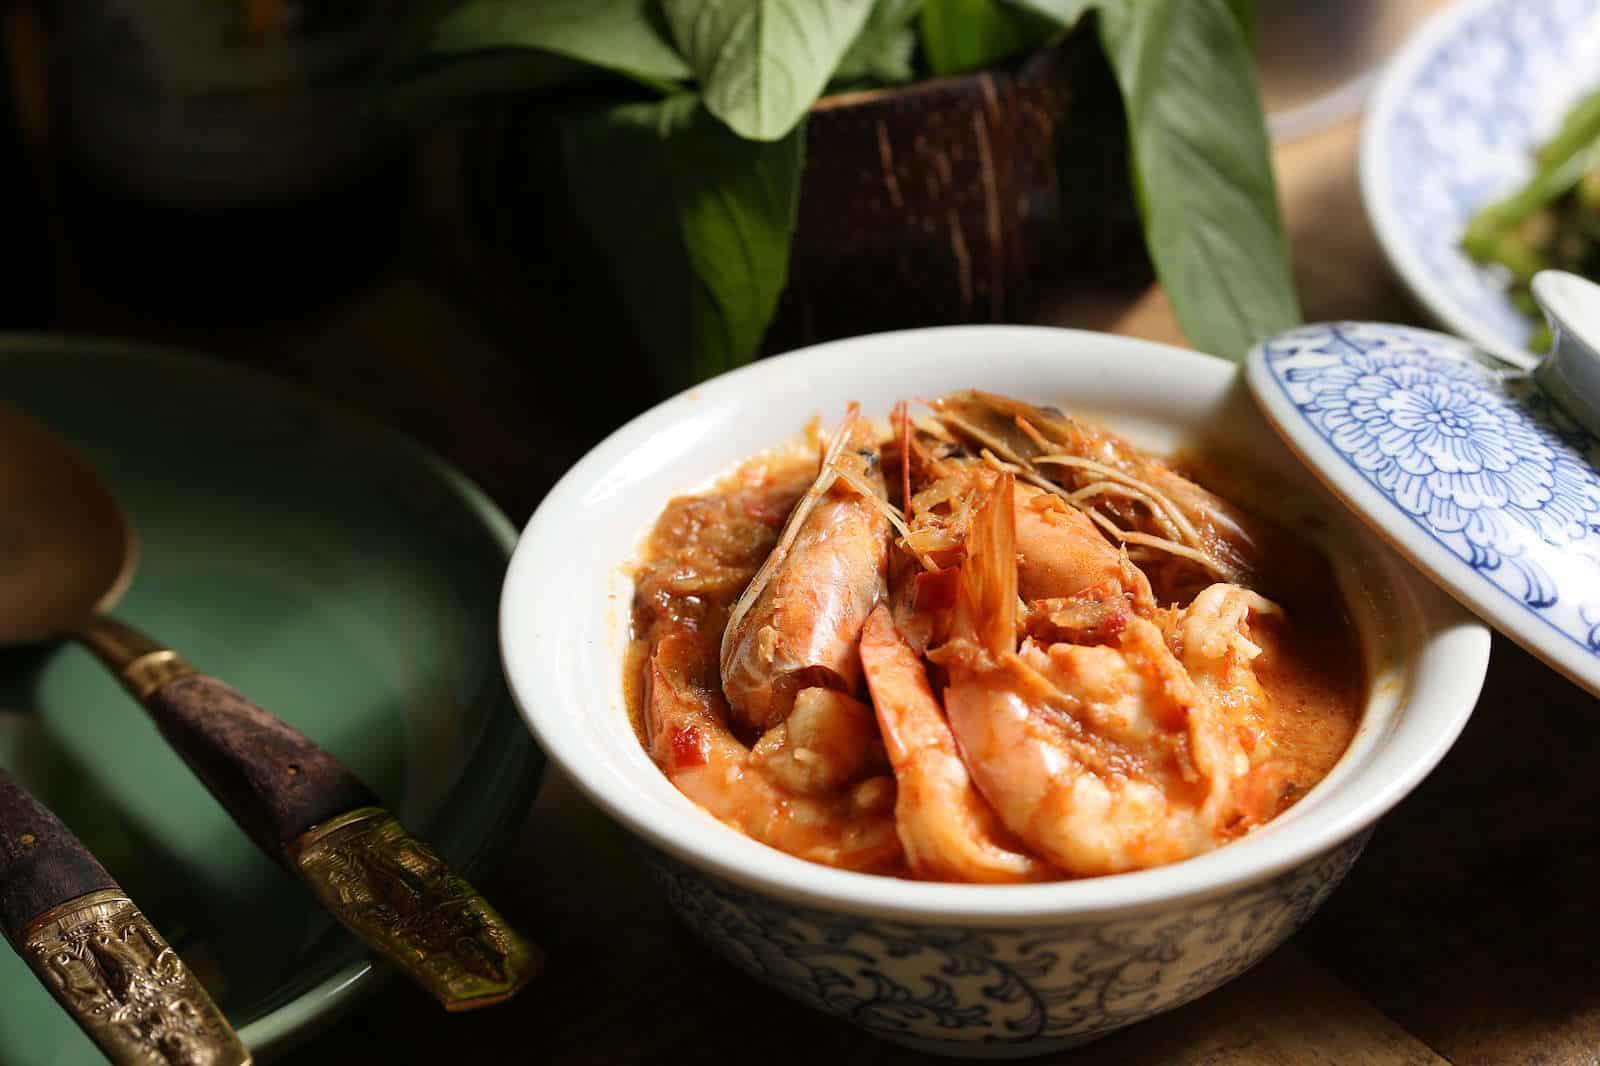 Lemongrass Thai Restaurant of San Antonio